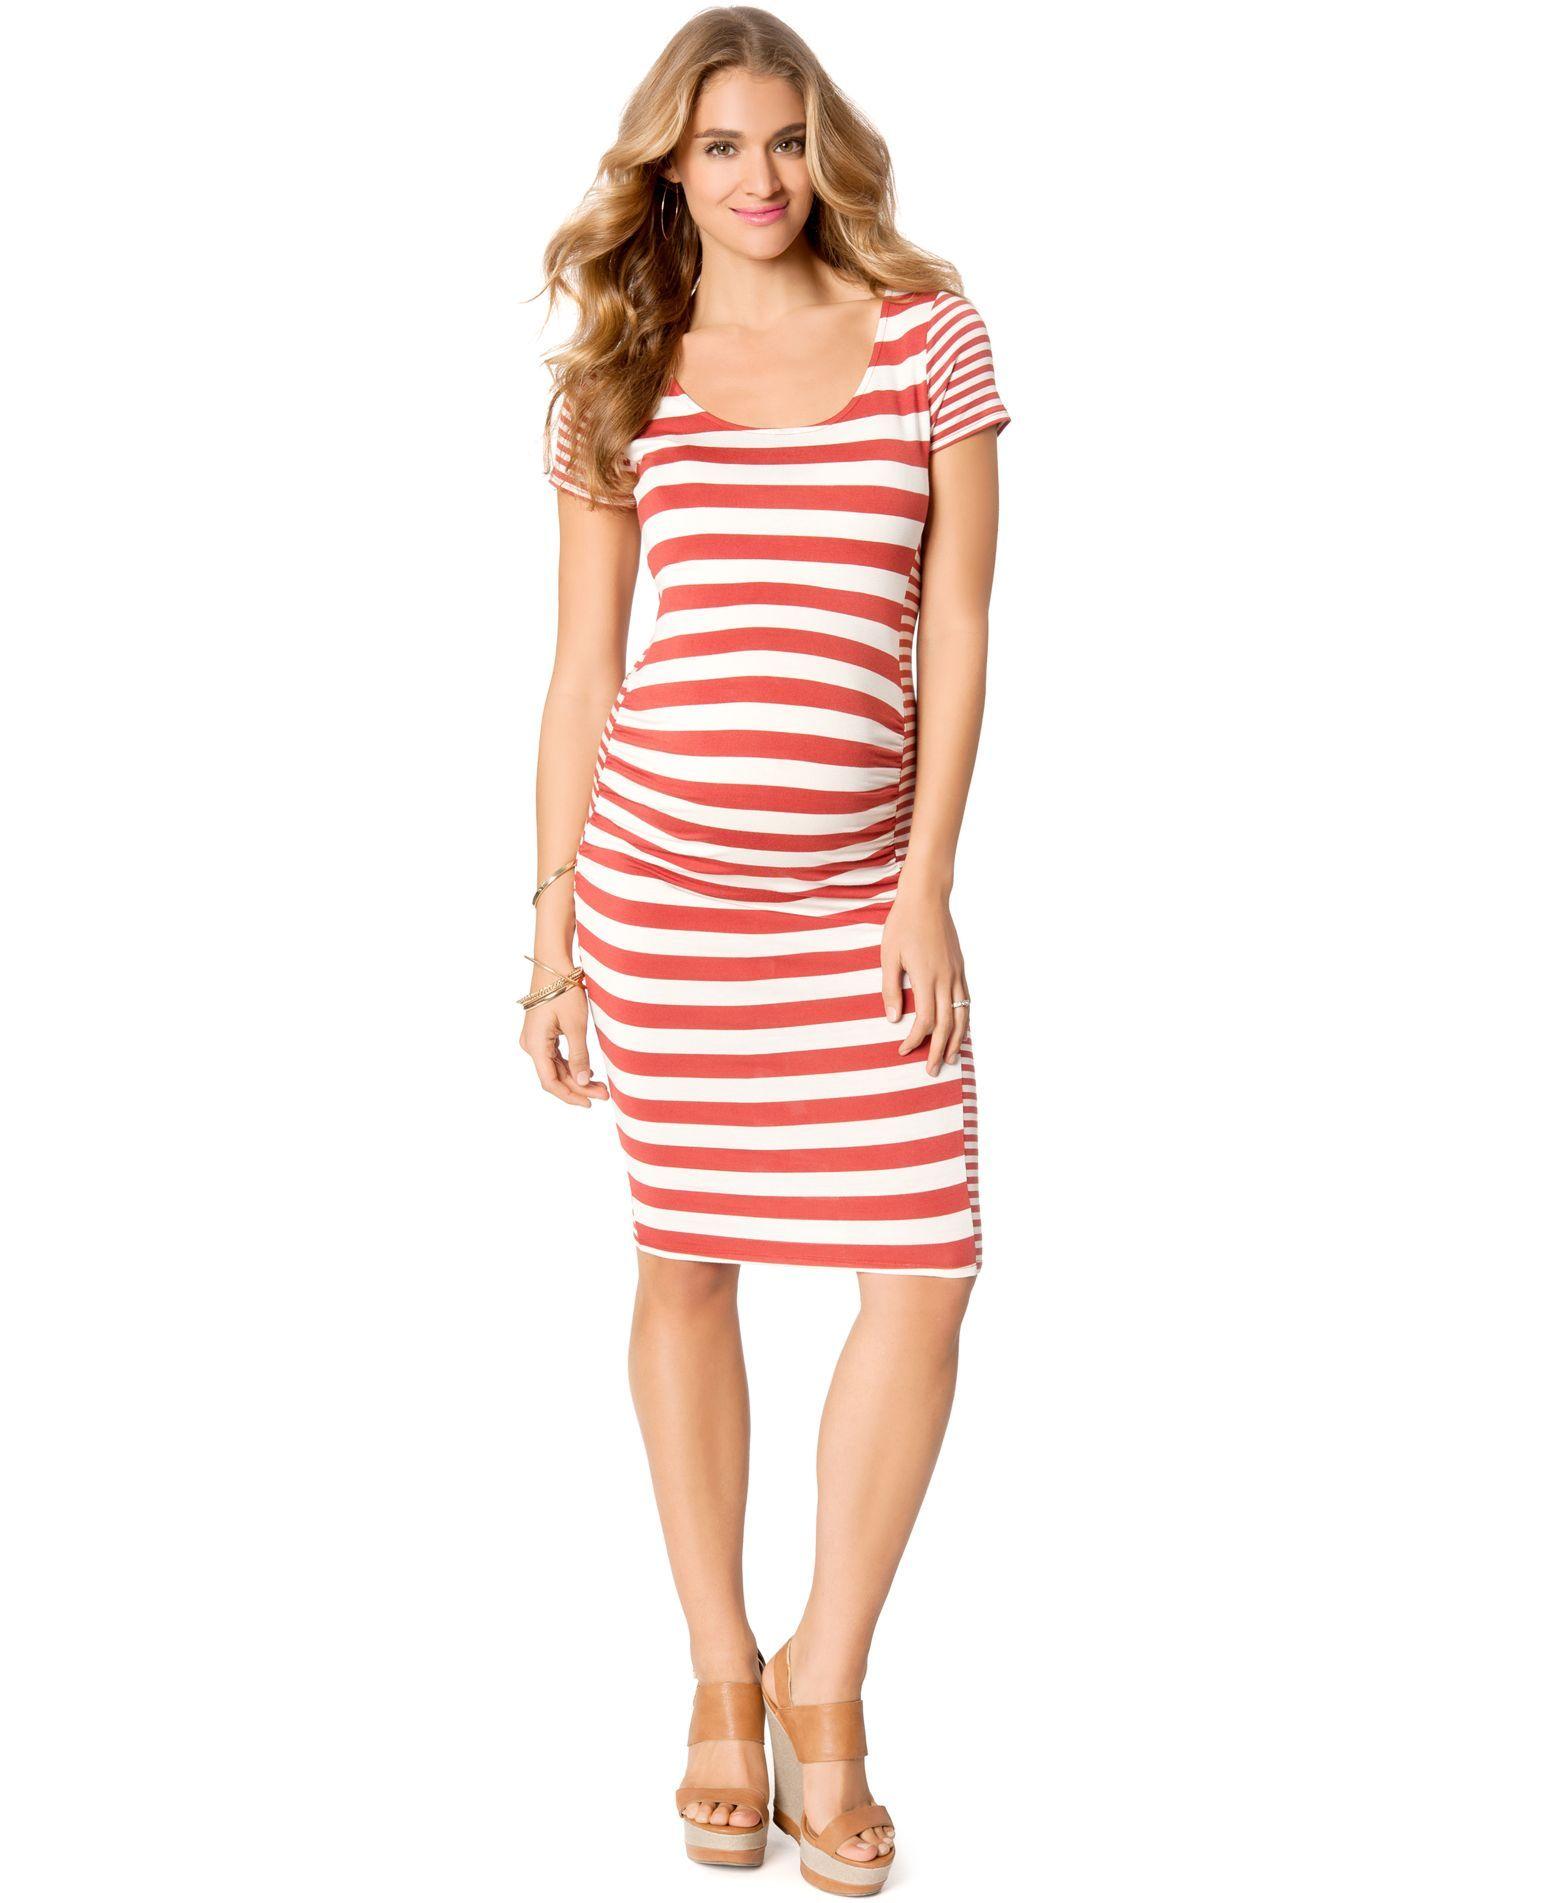 Jessica Simpson Maternity Striped Bodycon Dress | Family | Pinterest